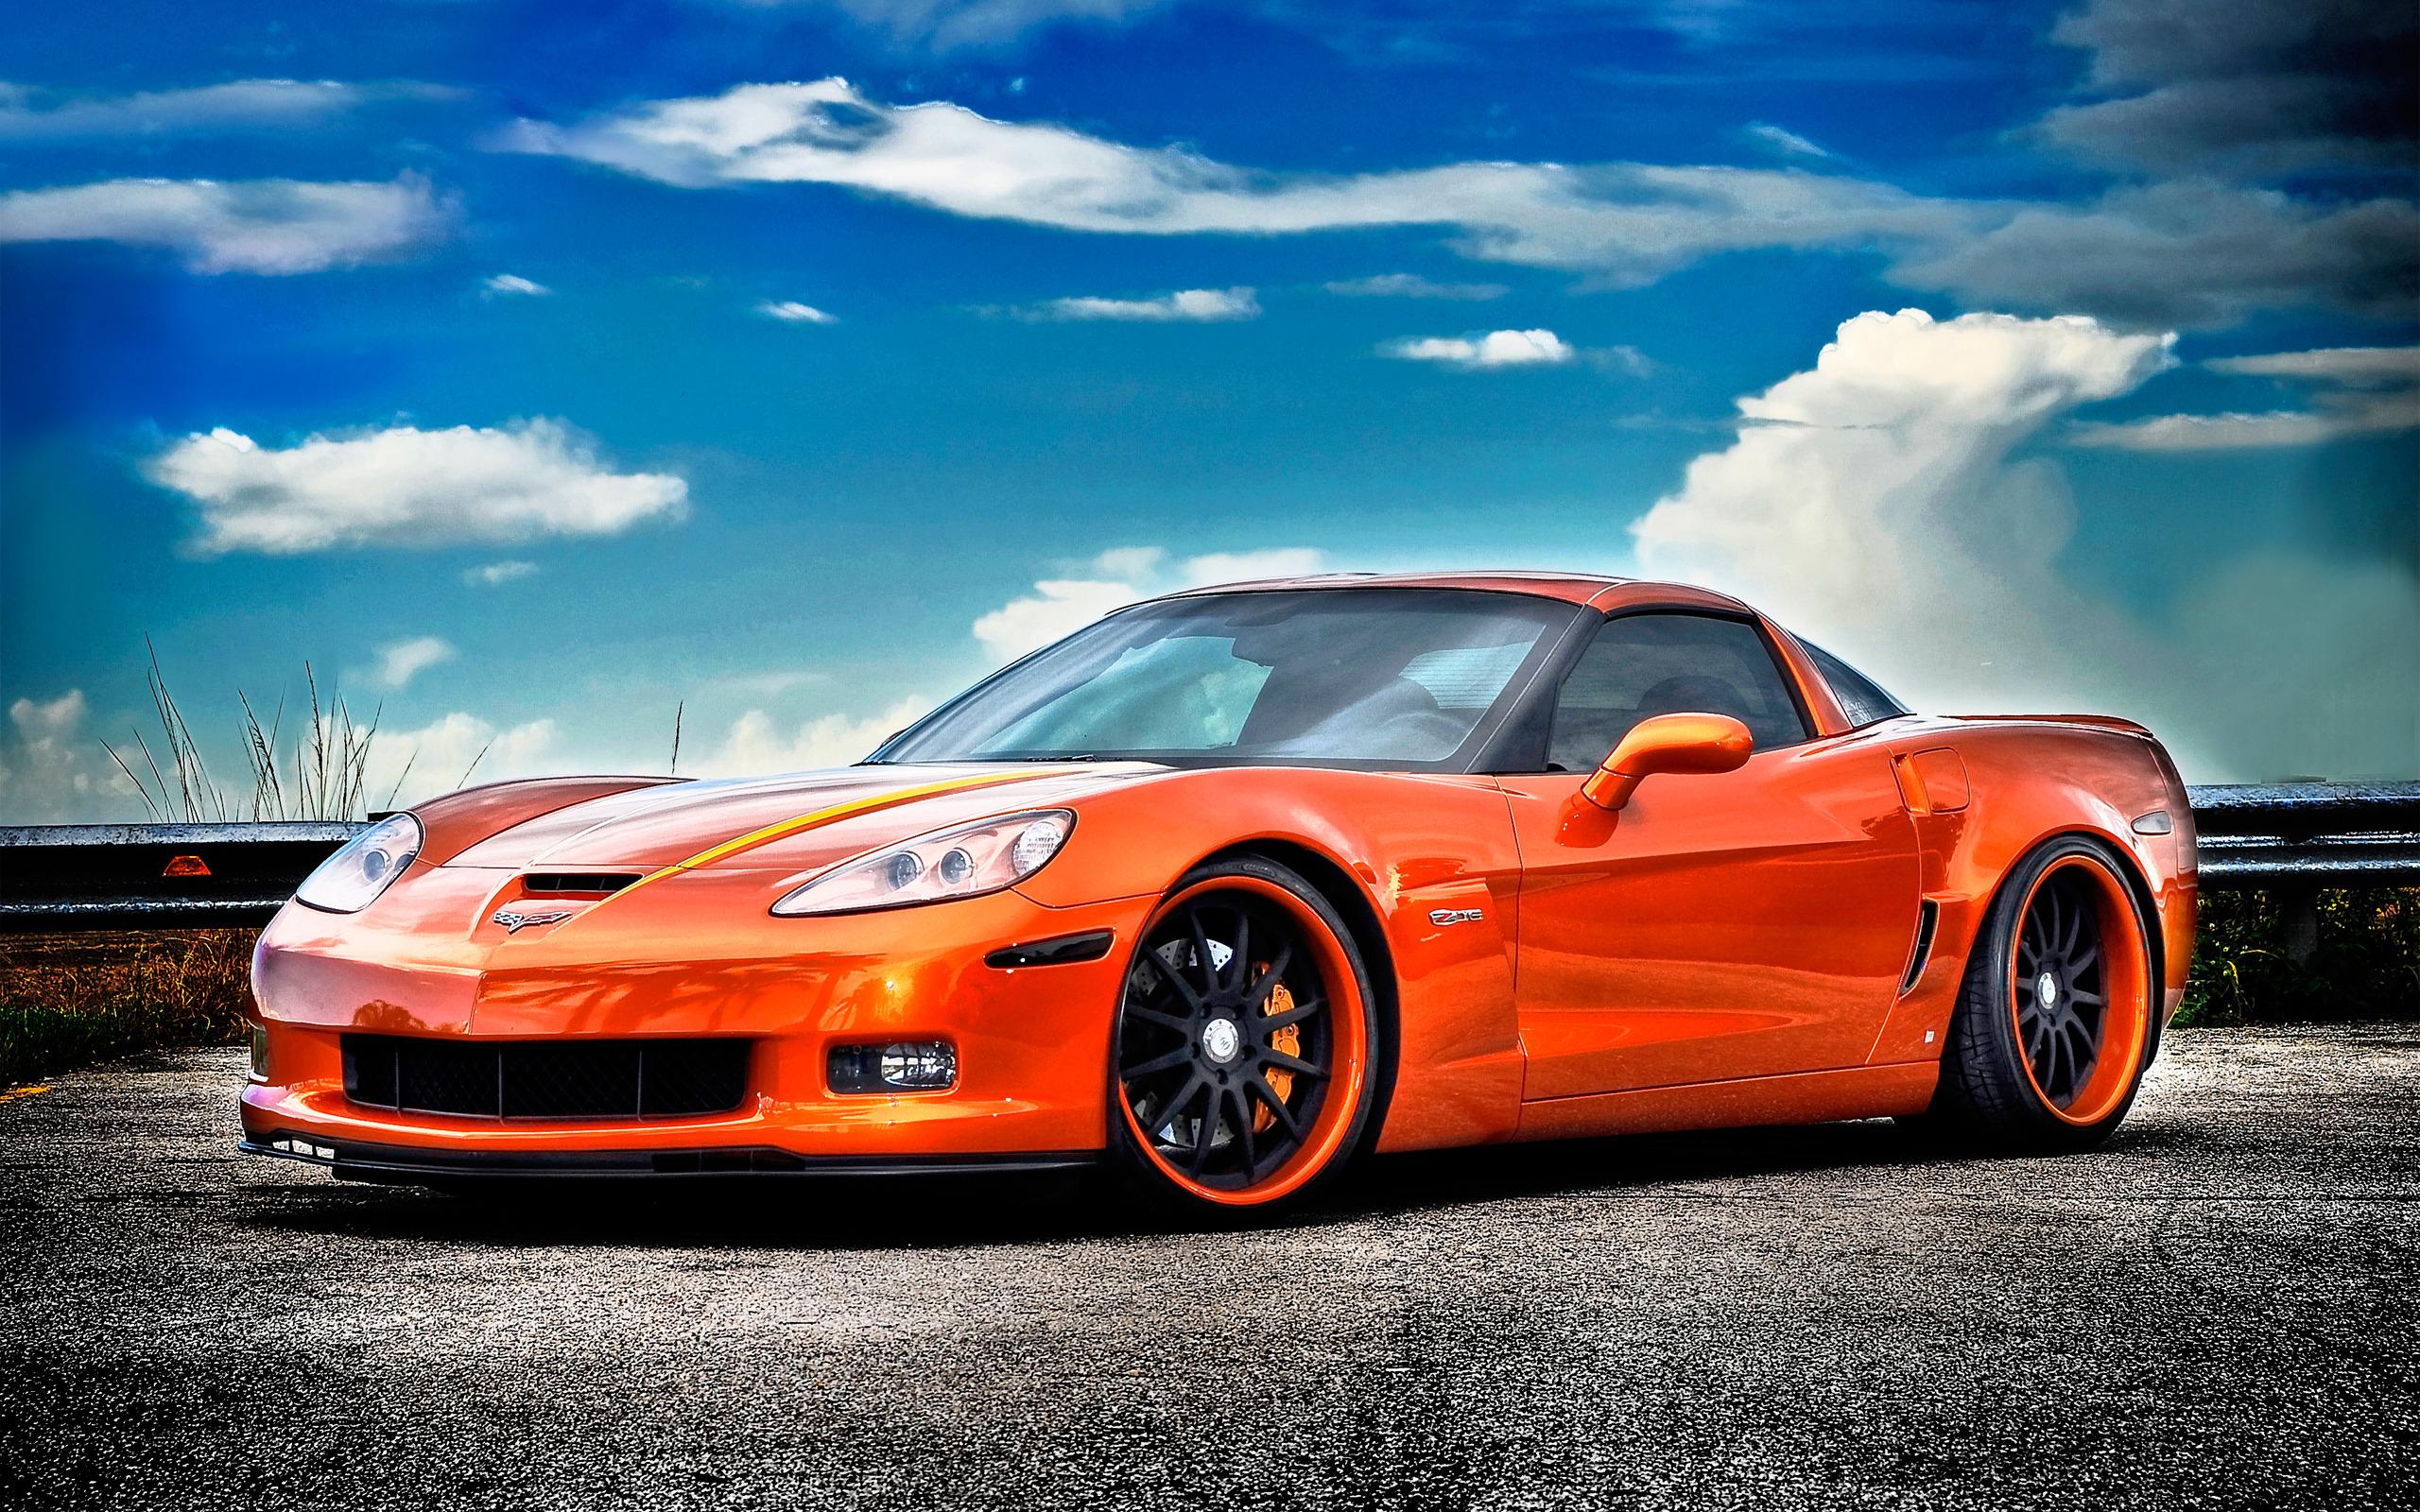 Gorgeous Corvette Wallpaper